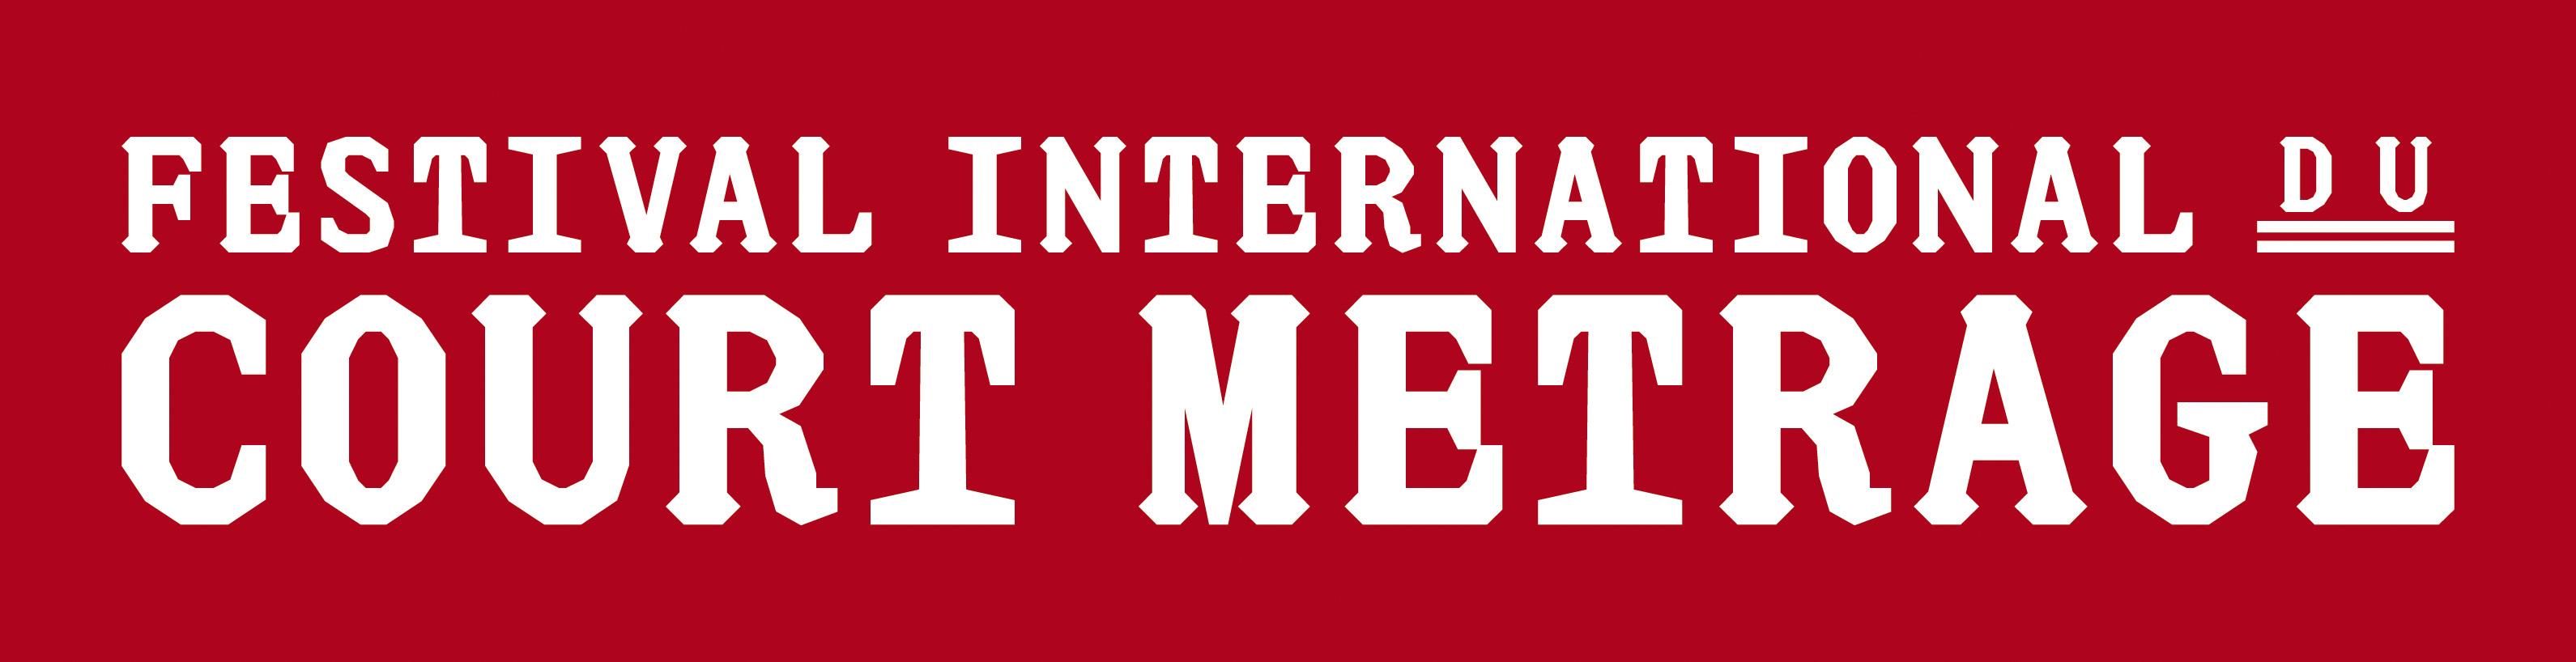 FESTIVAL INTERNATIONAL DU COURT METRAGE